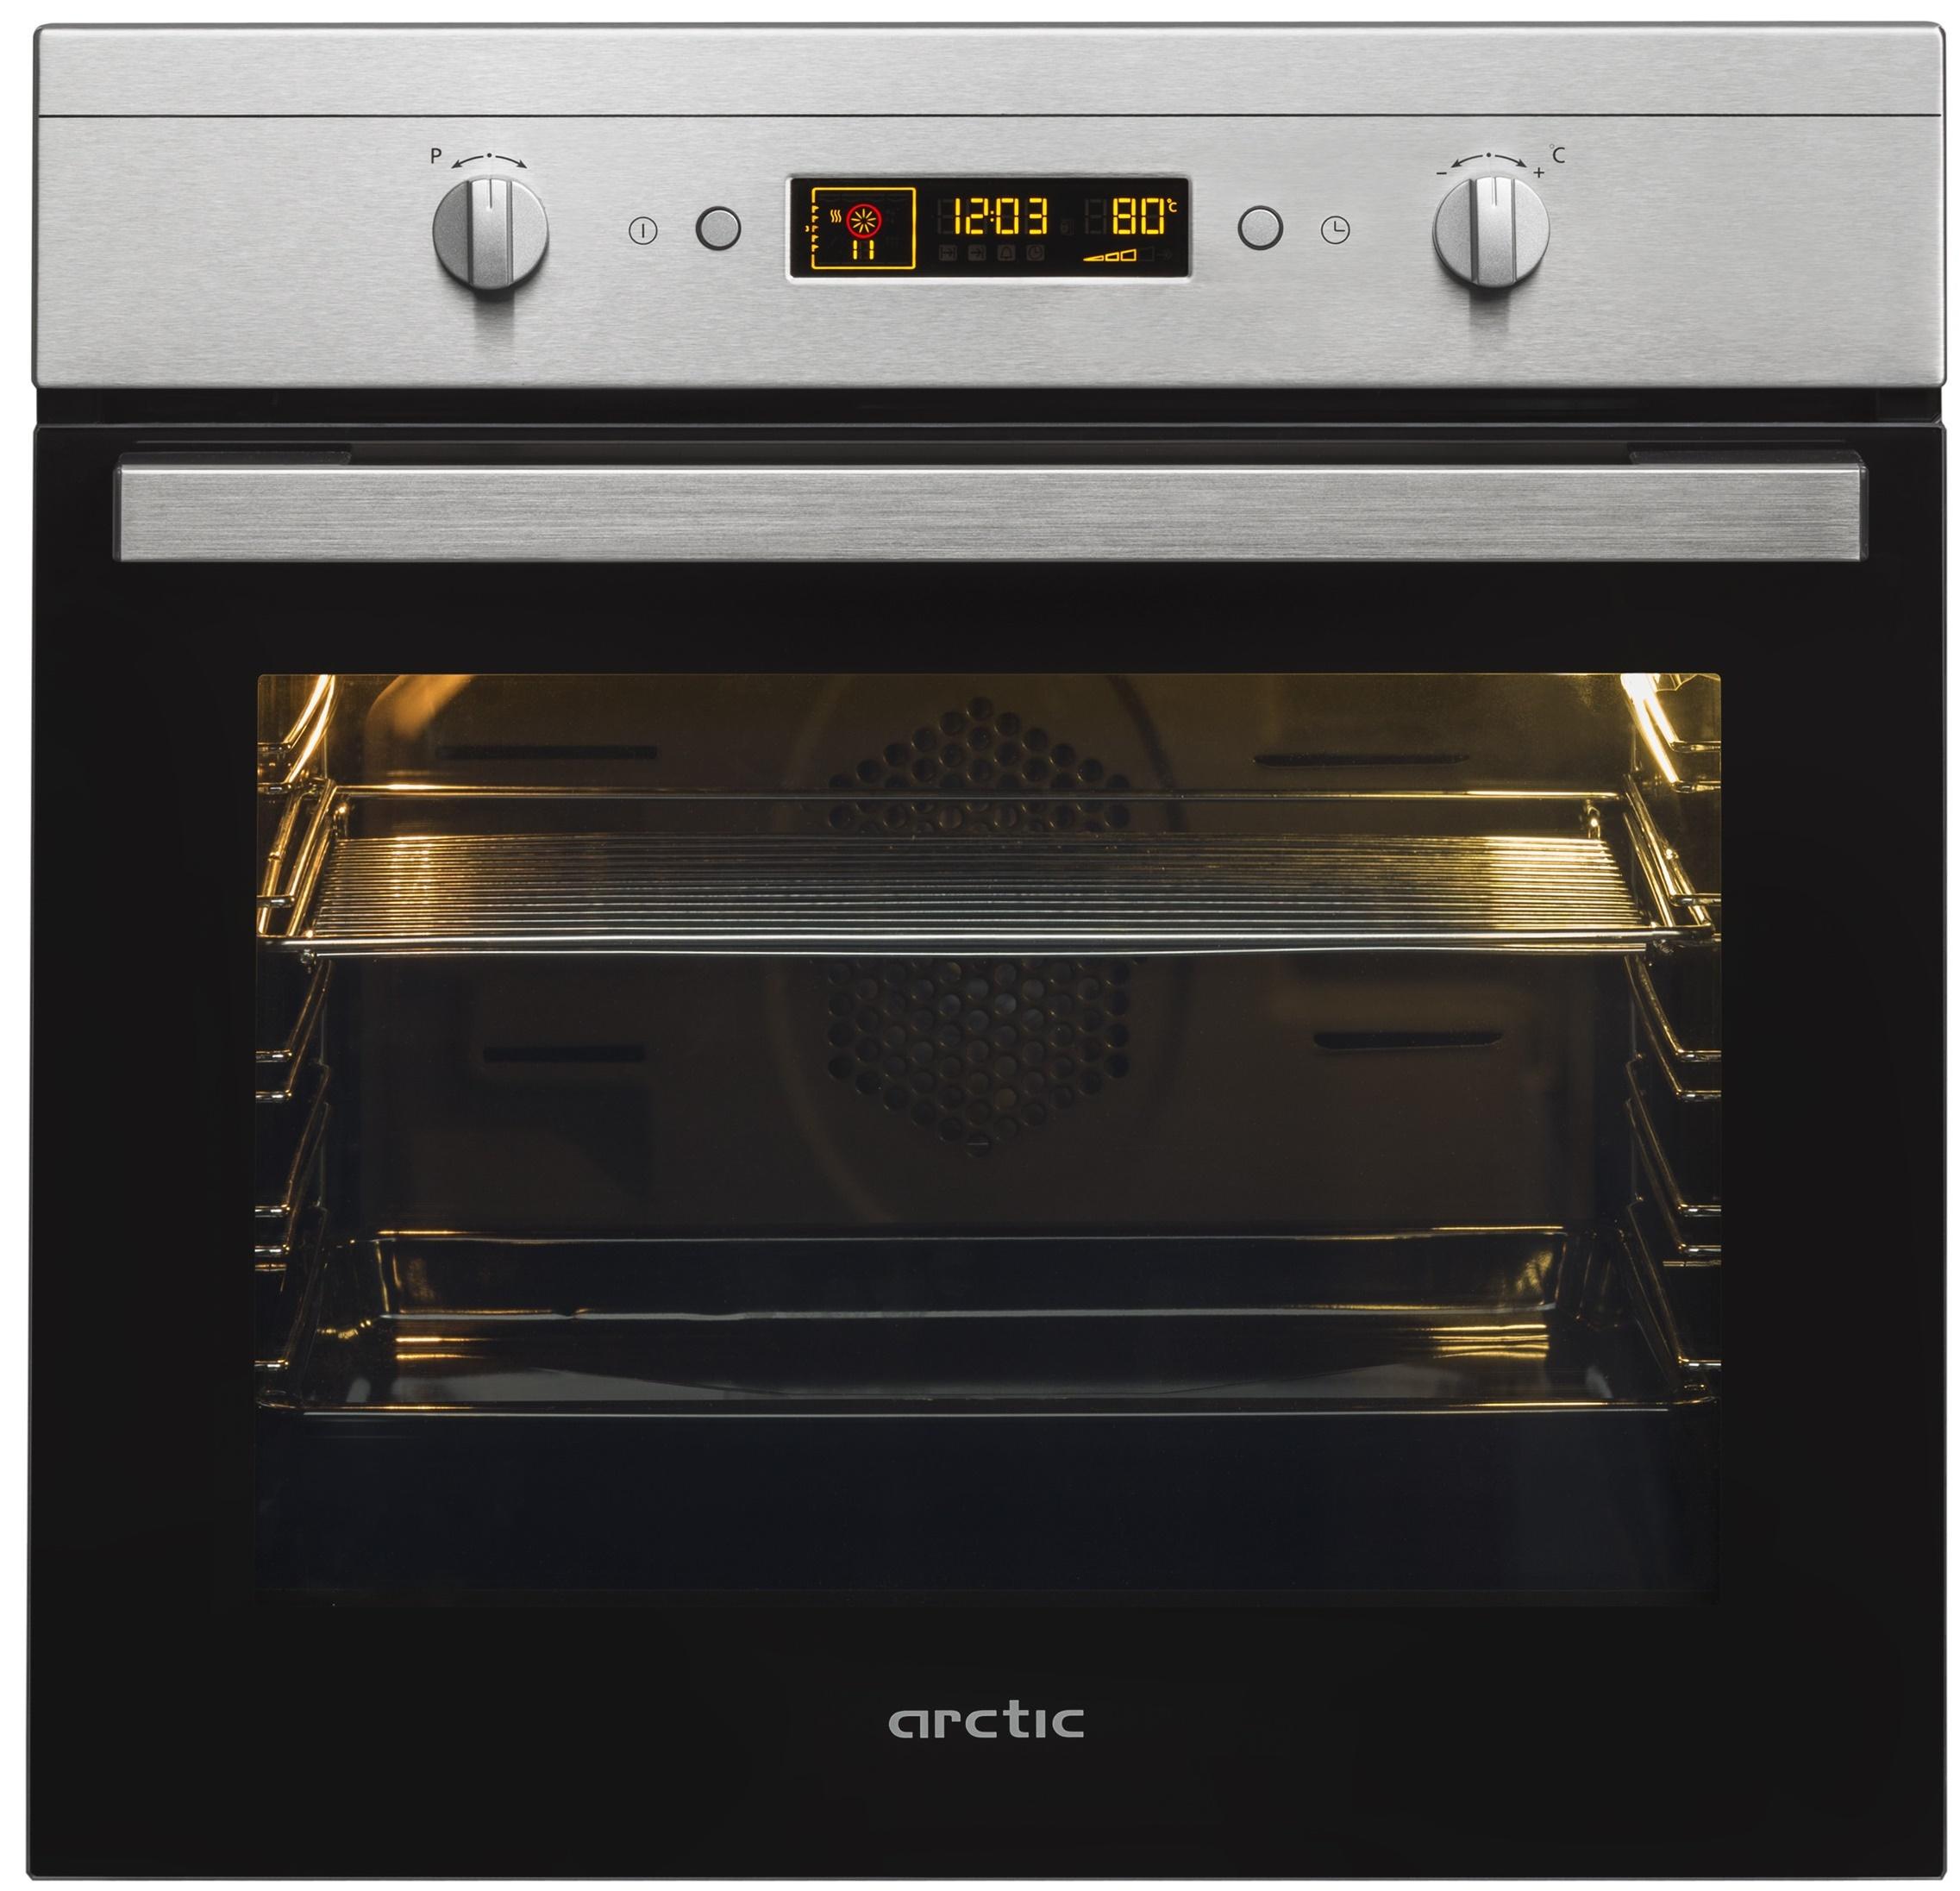 Cuptor incorporabil electric Arctic AROIM22500X, 71L, grill, negru si inox